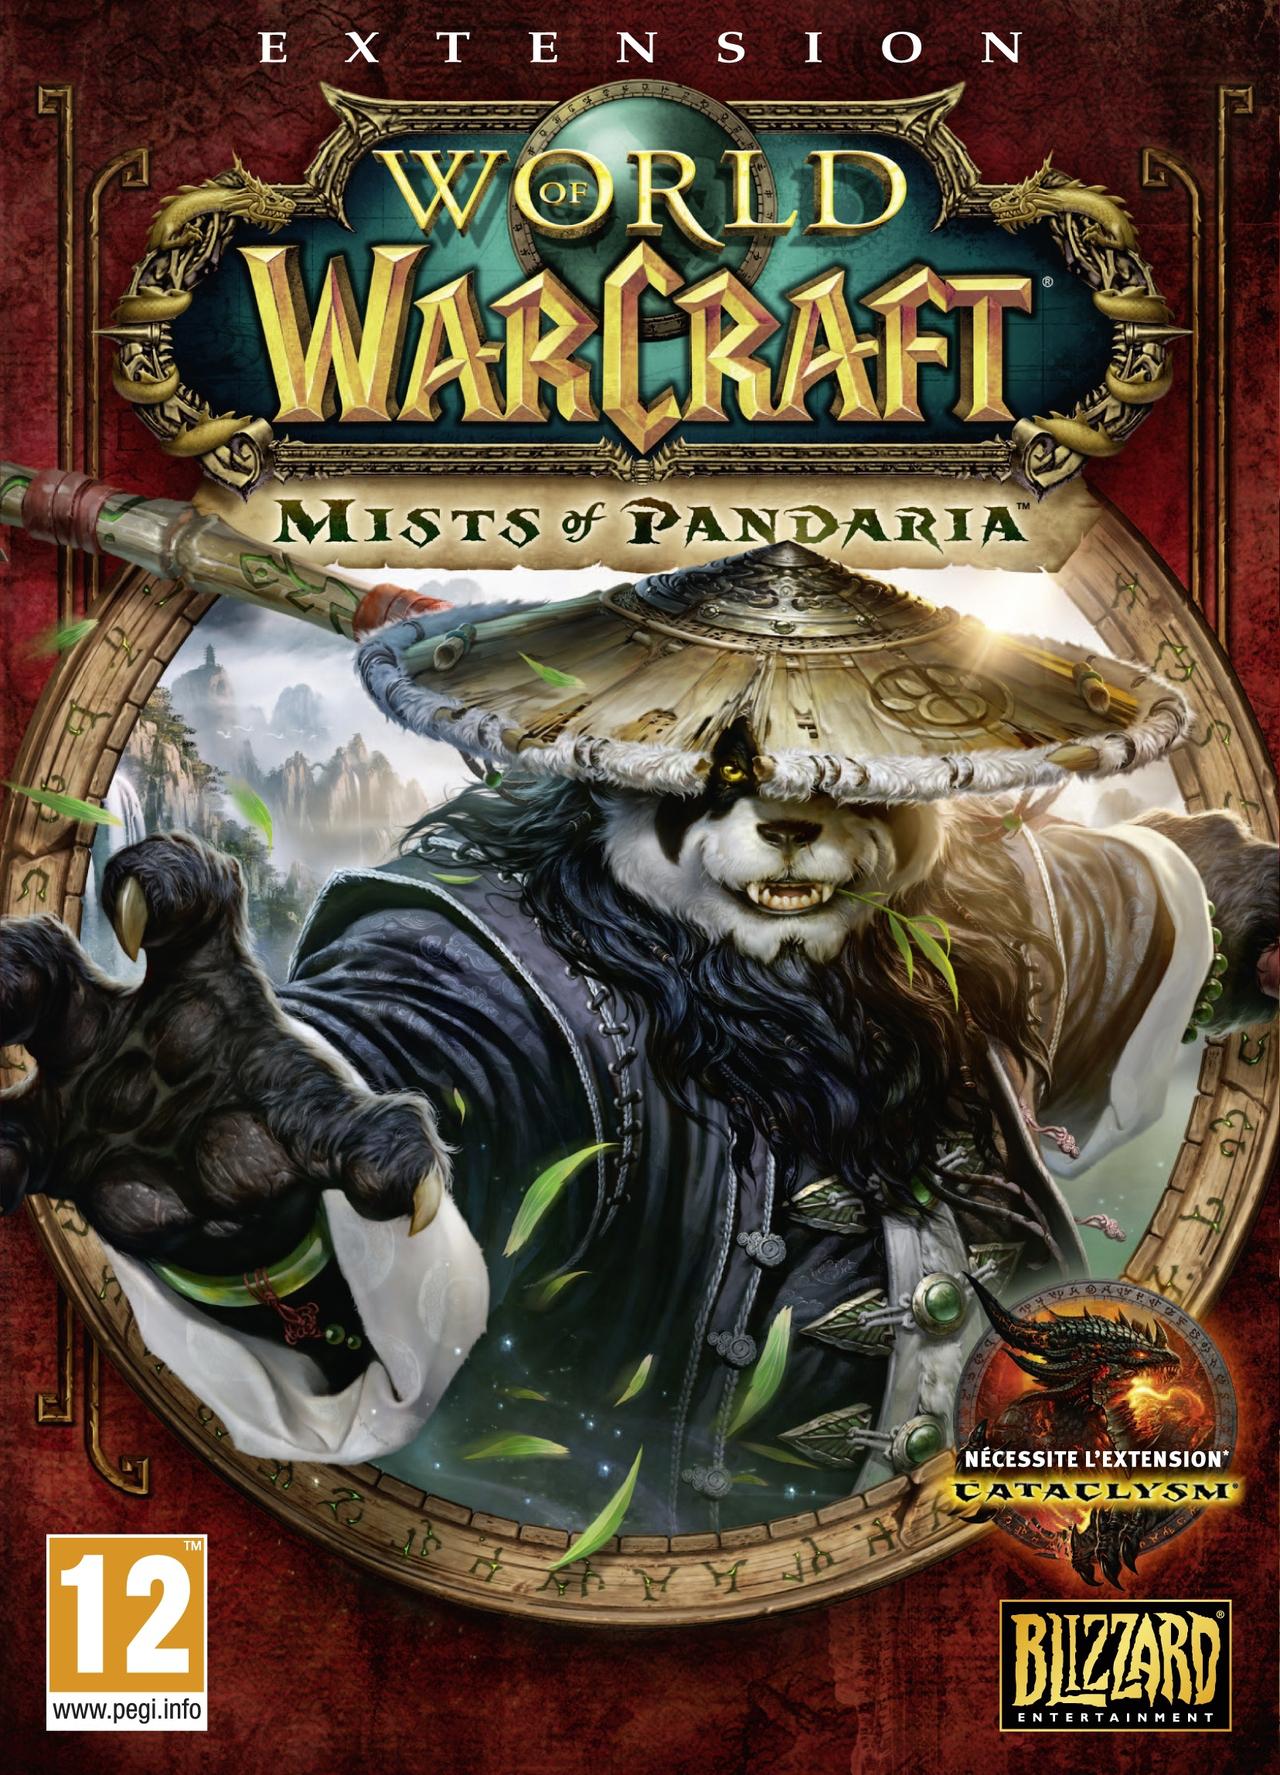 World of Warcraft - Complet avec toutes les extensions